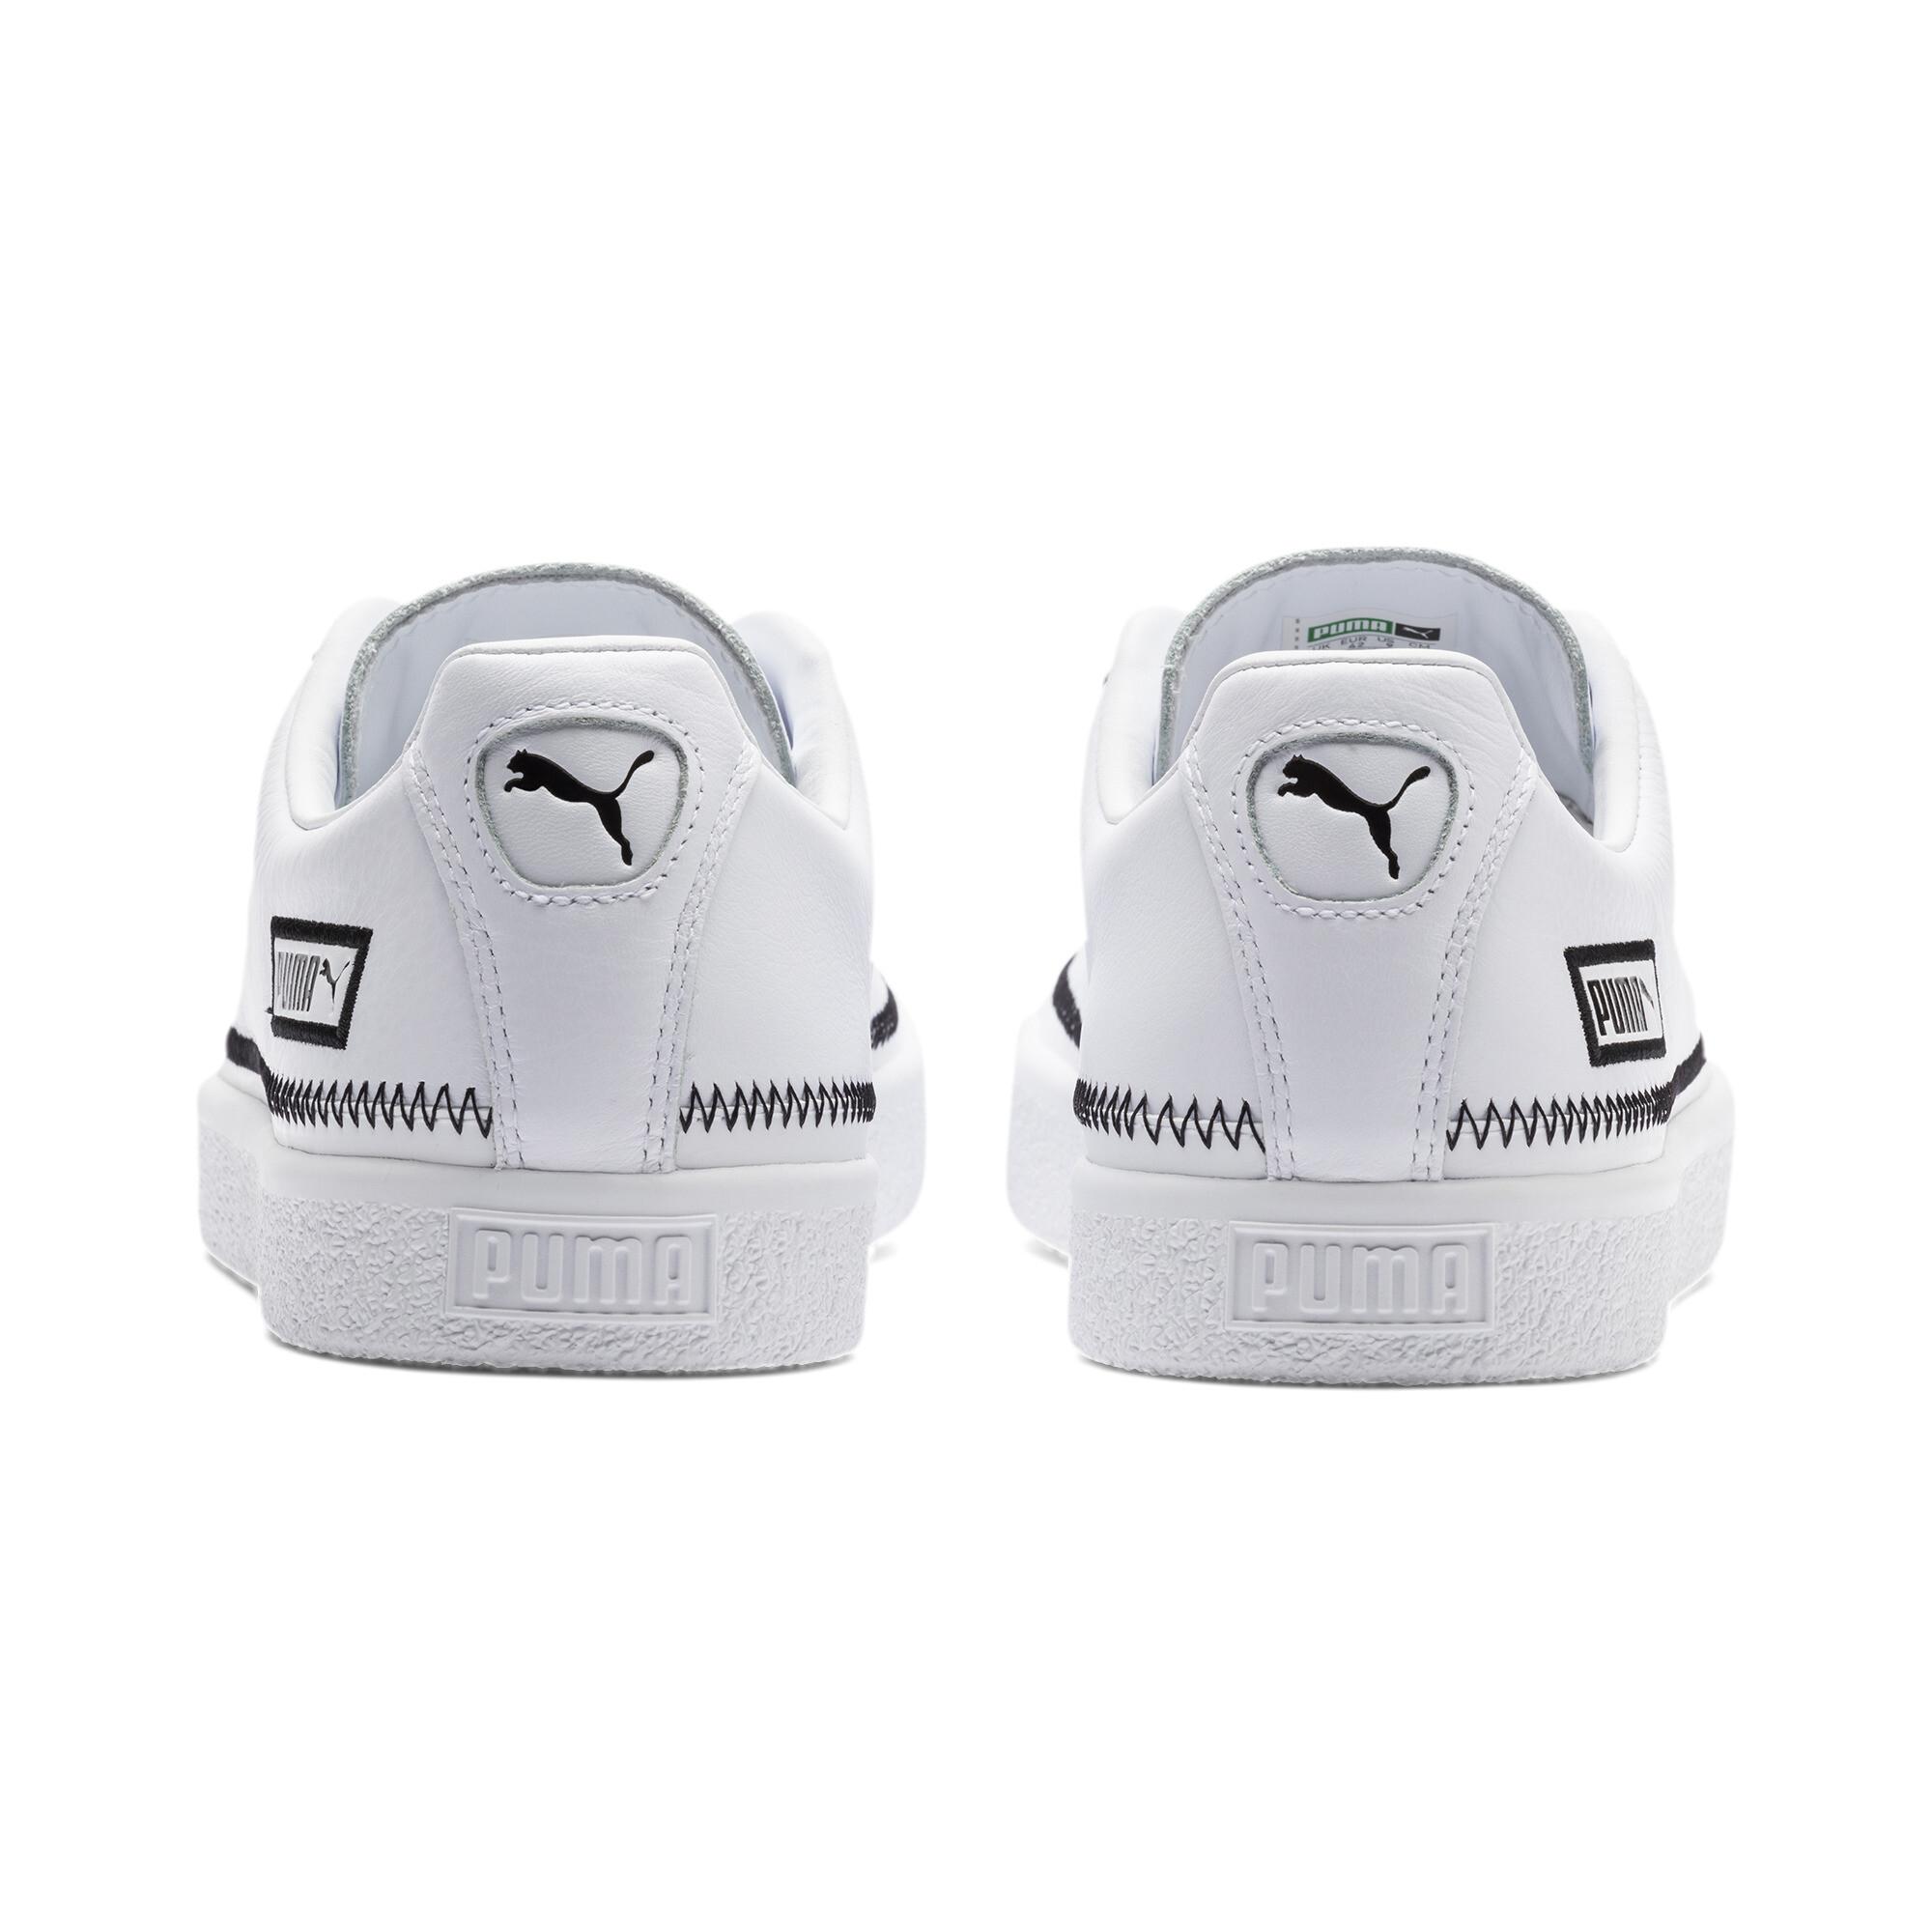 PUMA-Basket-Stitch-Sneaker-Unisex-Schuhe-Neu Indexbild 15